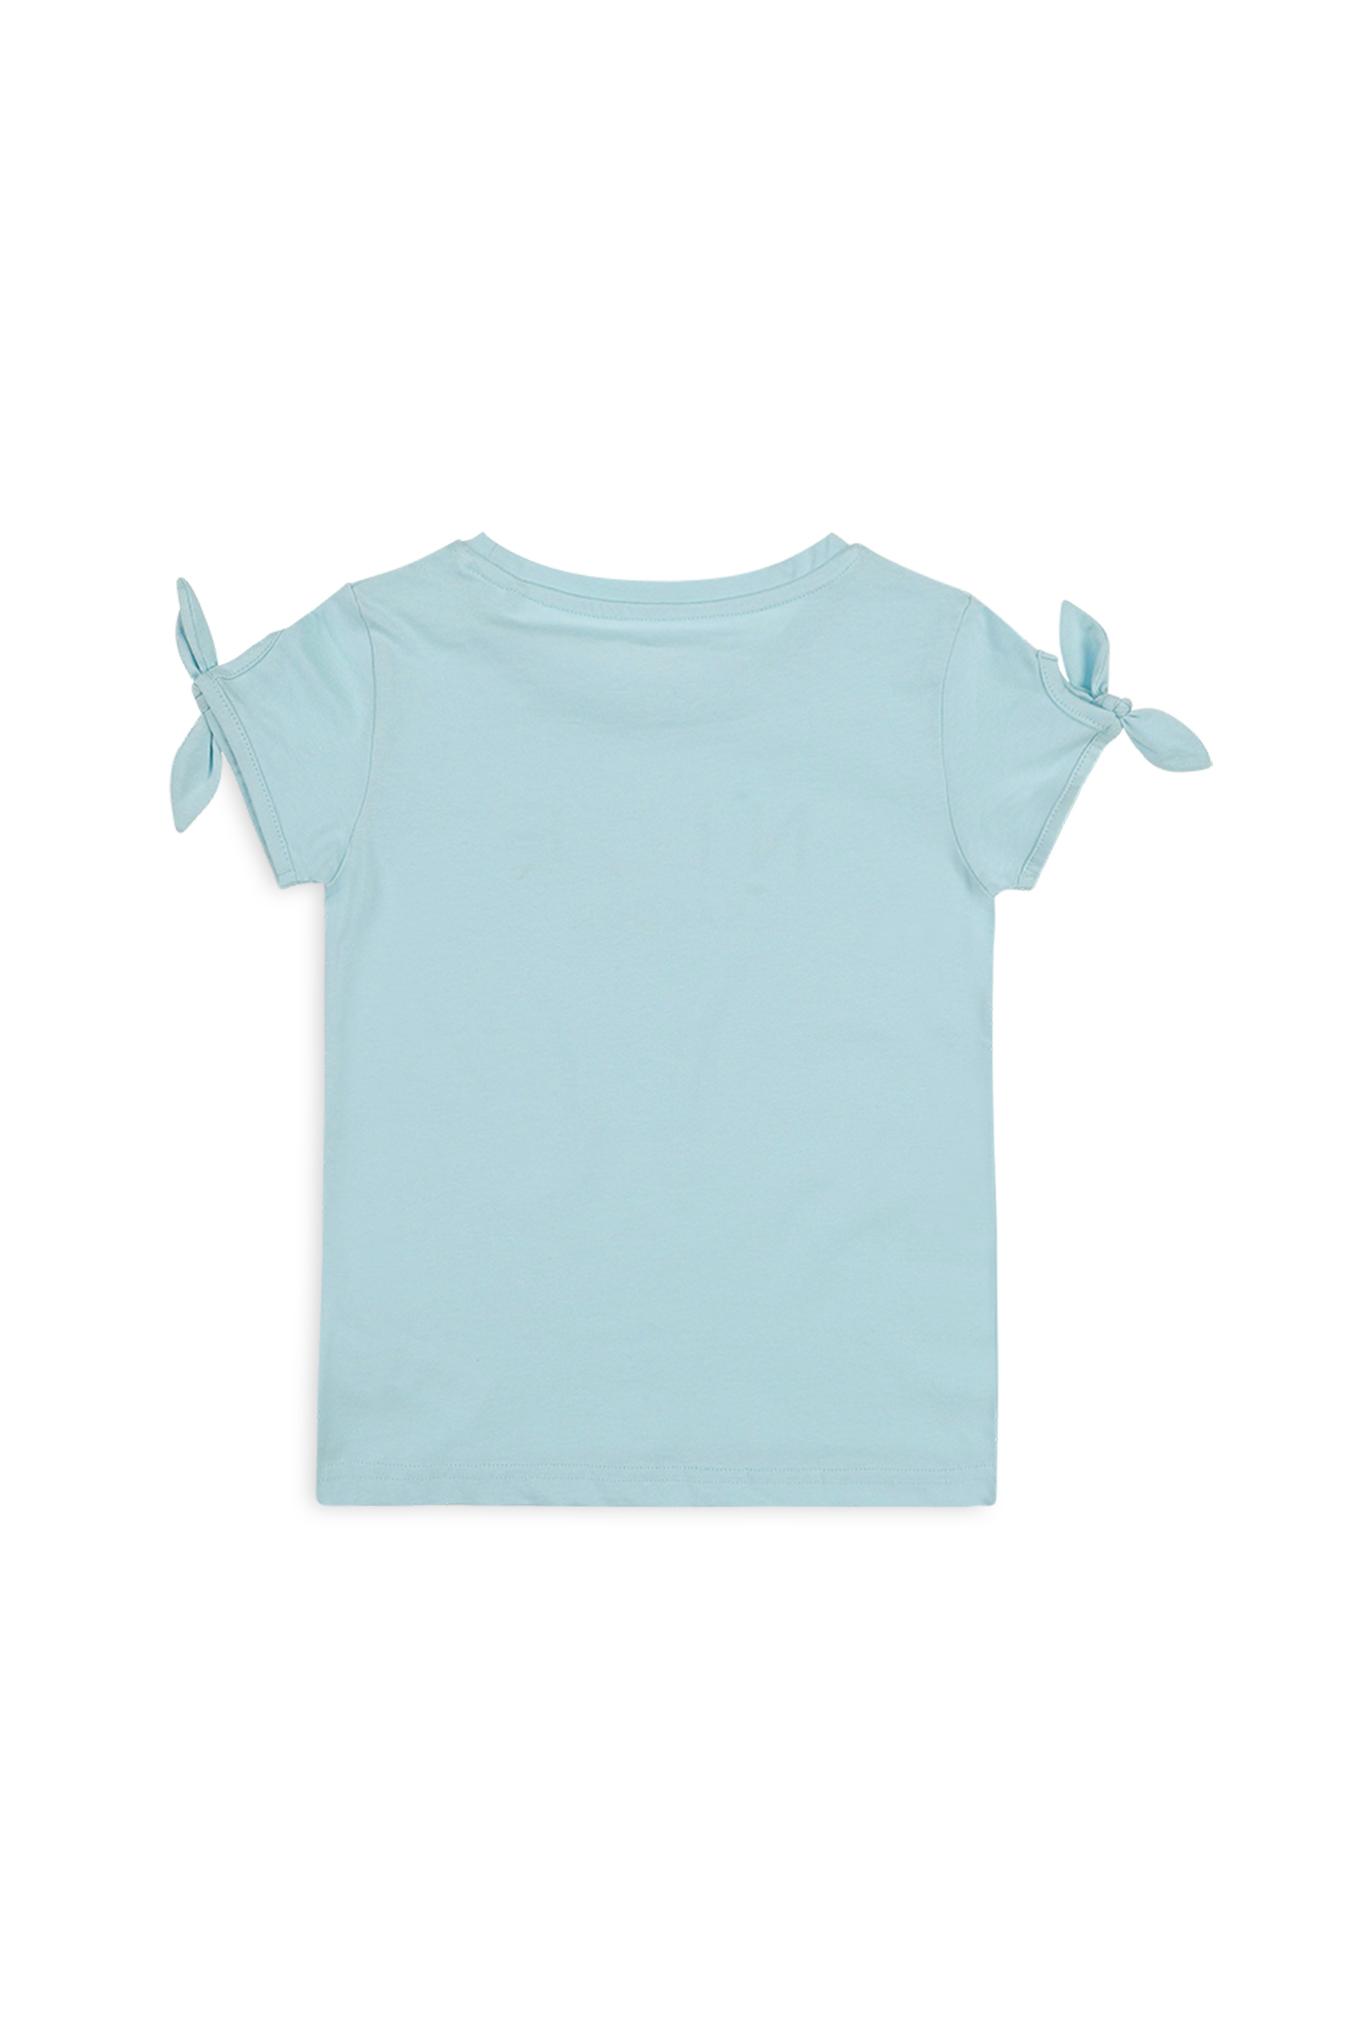 T-Shirt Aqua Sport Girl